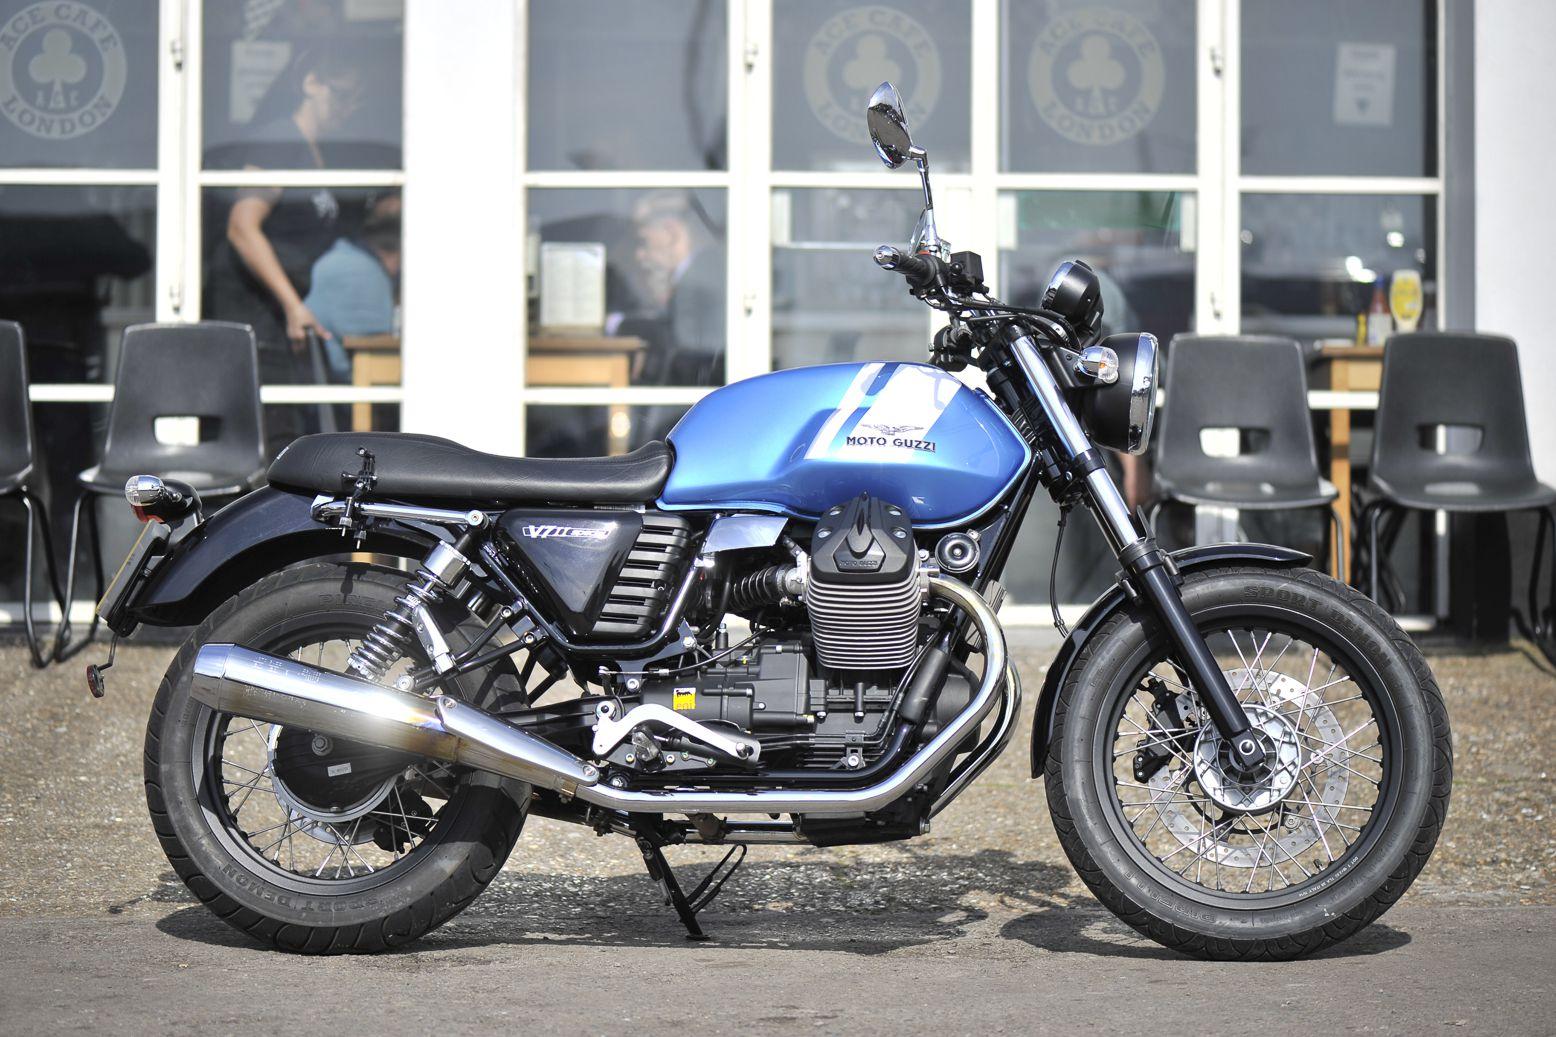 Retro bike group test: Yamaha XSR700 vs Ducati Scrambler vs Bonneville Street Twin vs Guzzi V7 II